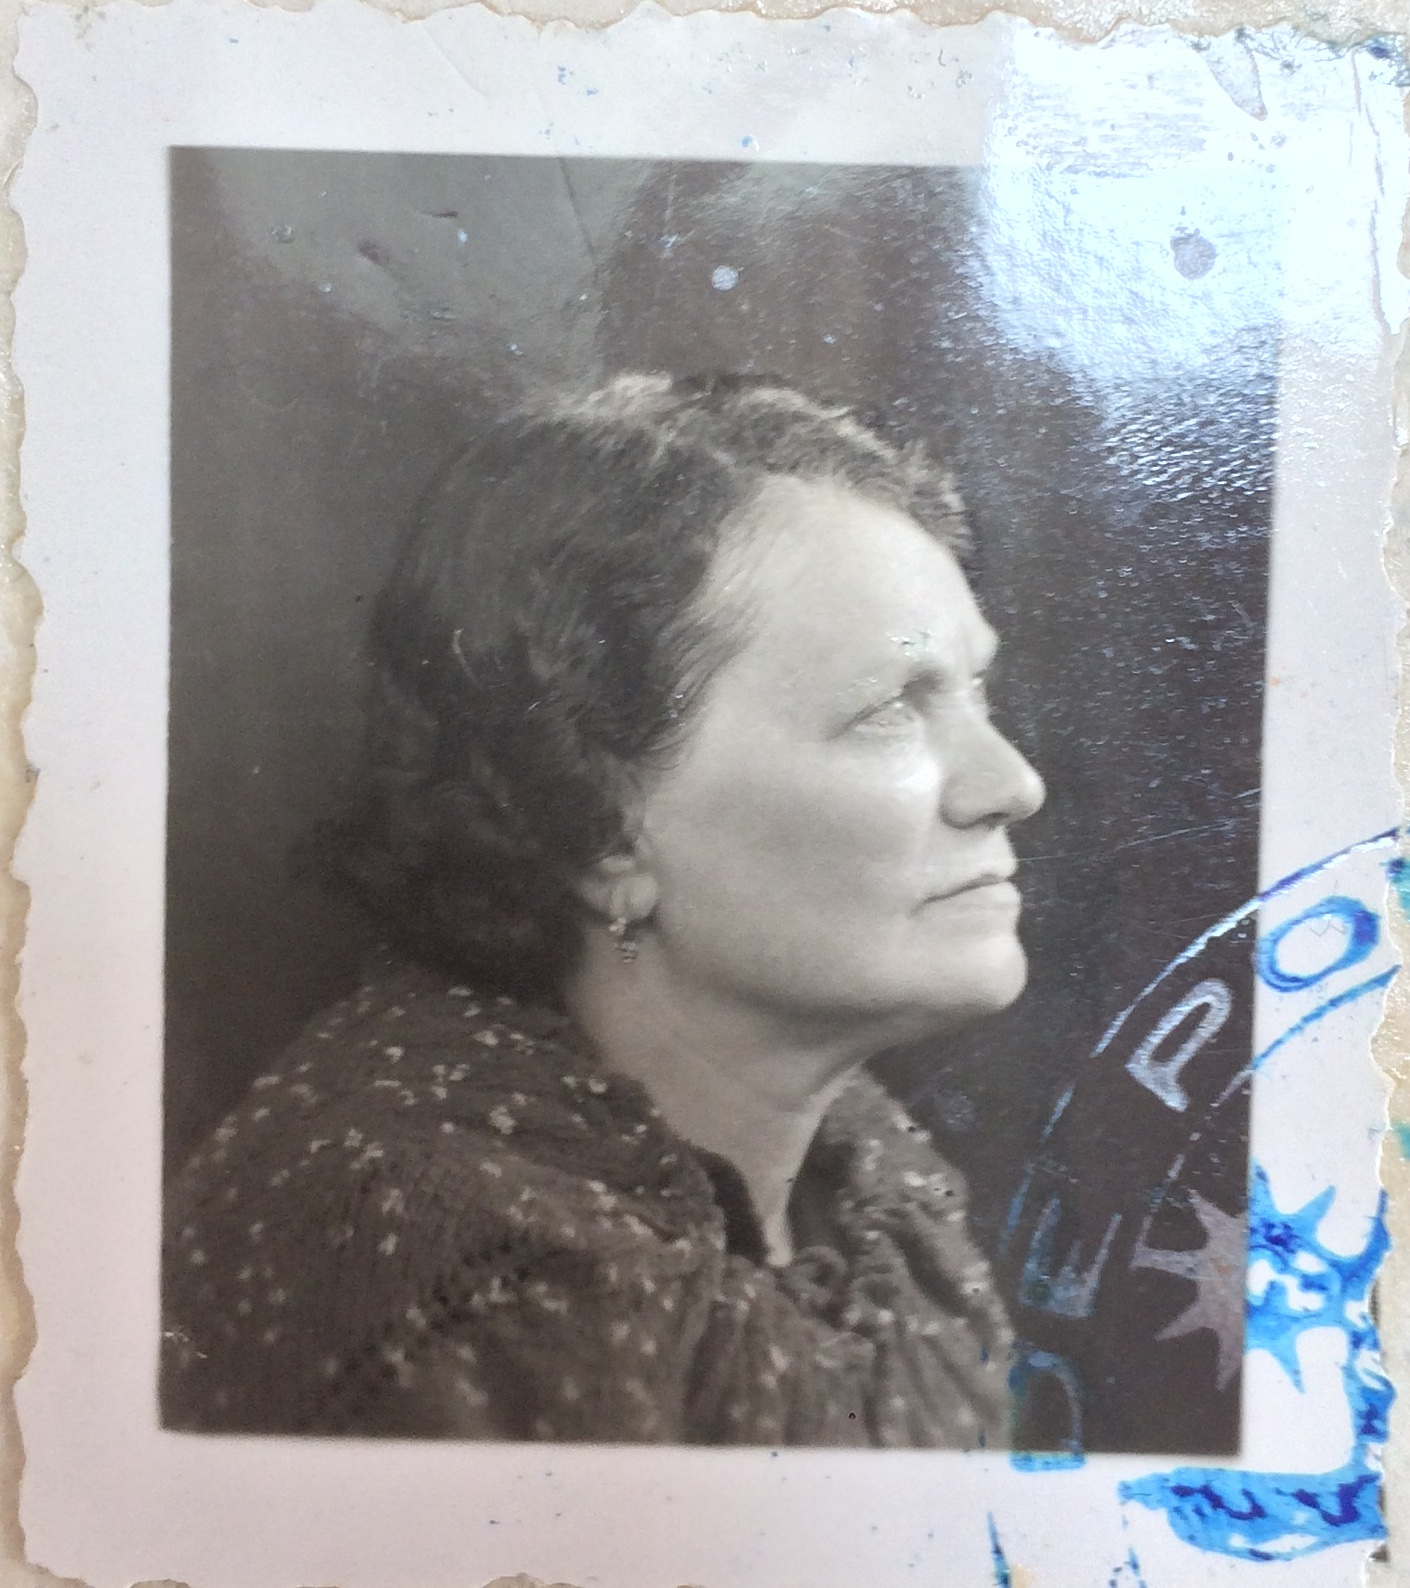 Oro AROUETE 1940 [ADLA 4M925]